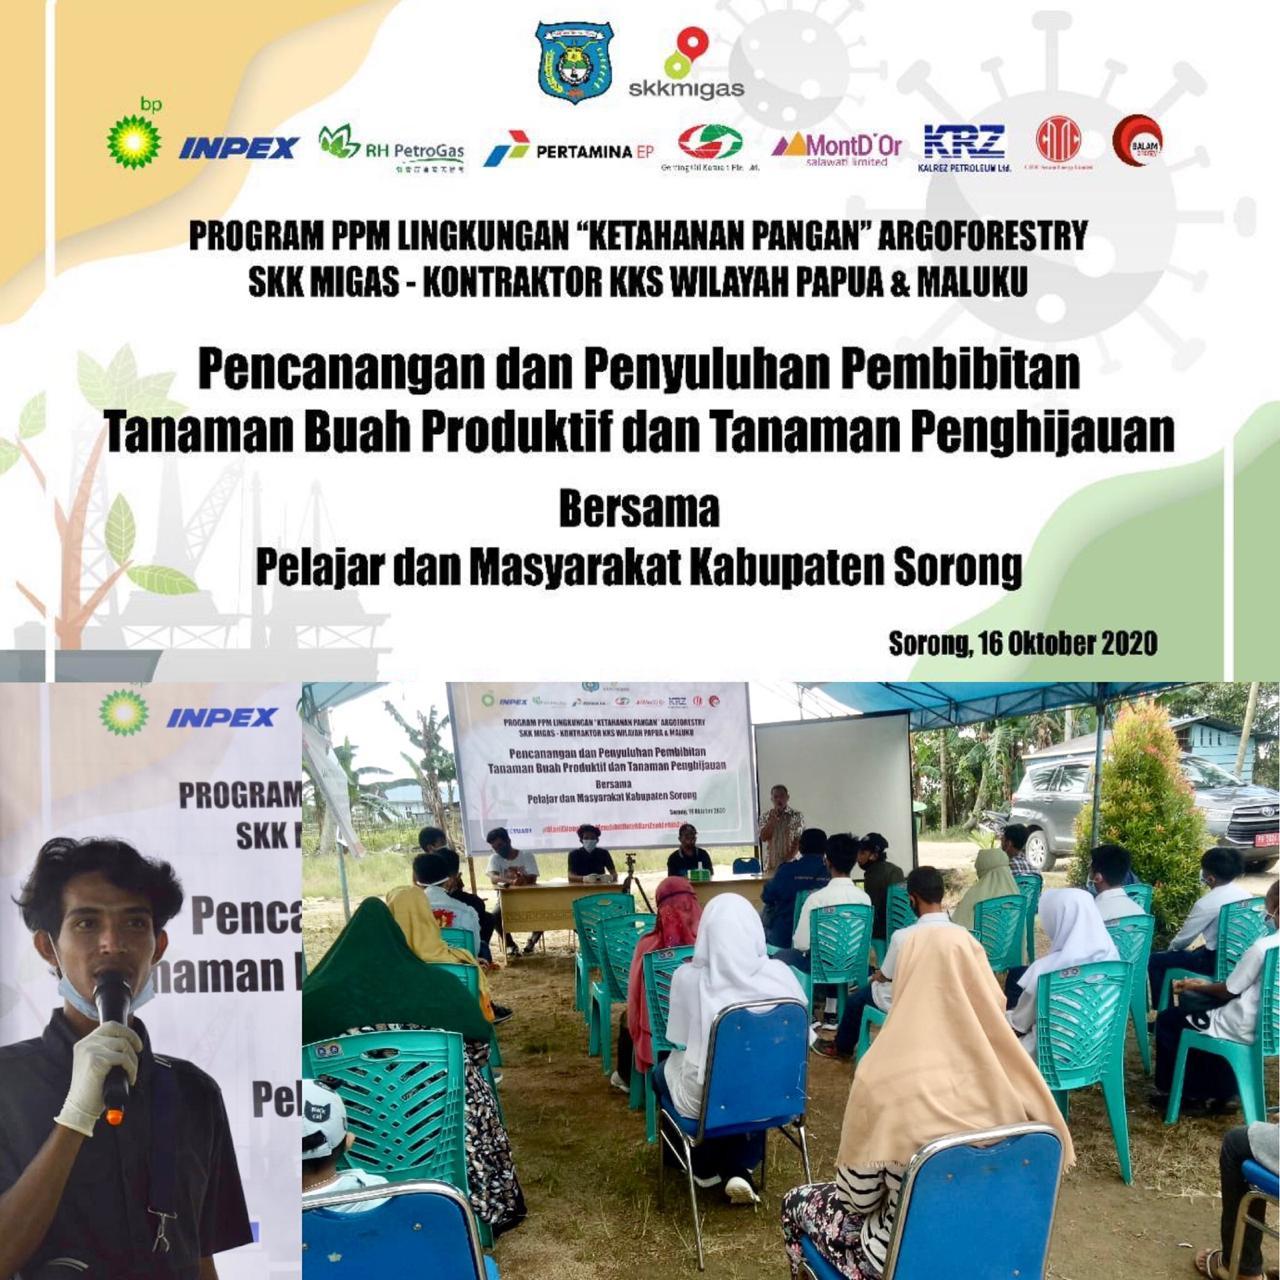 Peringati Hari Pangan Sedunia 2020, SKK Migas – KKKS Papua Barat Melakukan Aksi PPM Lingkungan Bersama Pelajar dan Masyarakat di Kabupaten Sorong